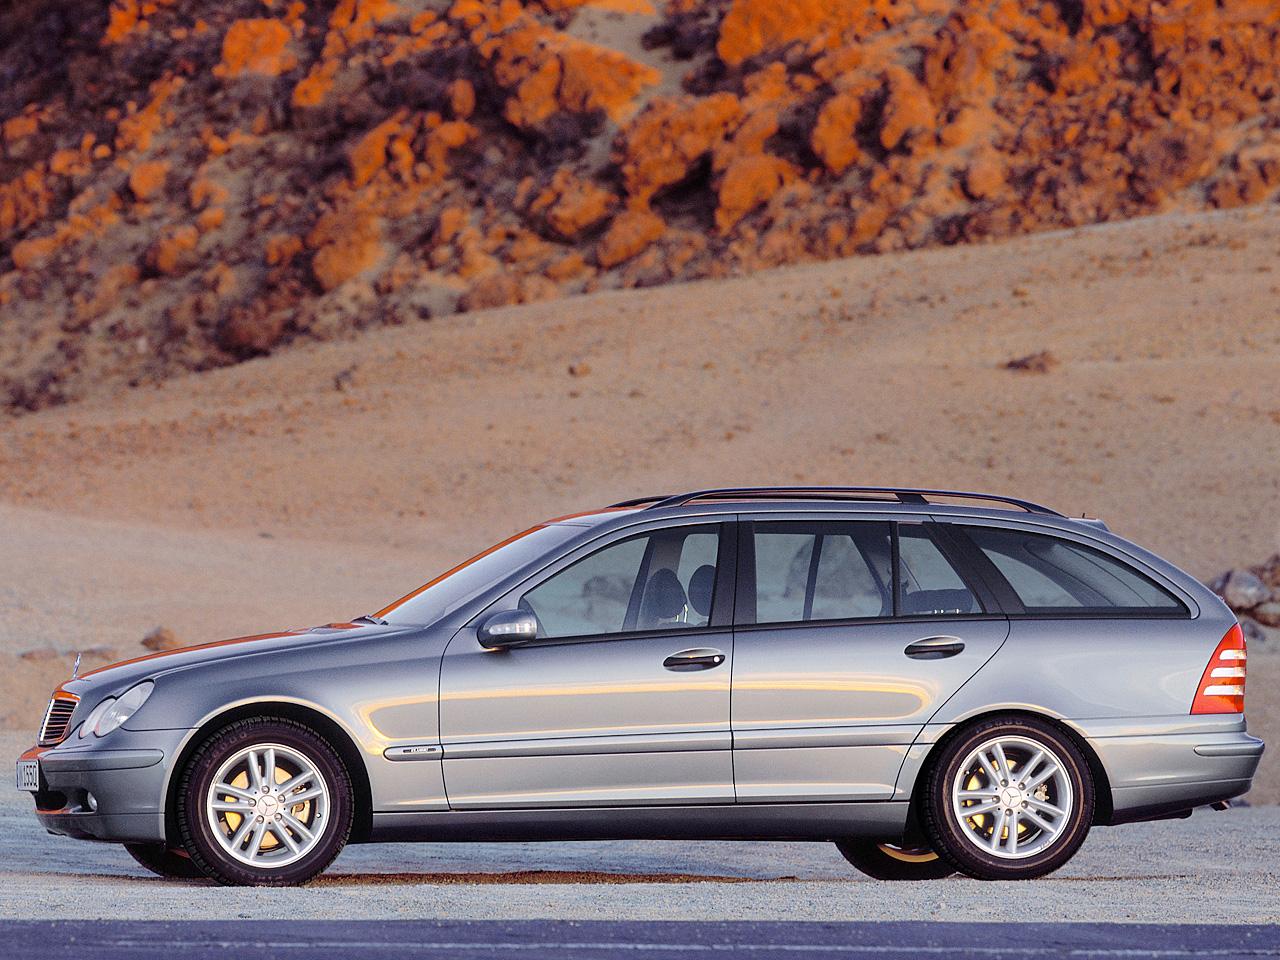 gebrauchtwagen test mercedes c klasse ab 2000 autobild de. Black Bedroom Furniture Sets. Home Design Ideas